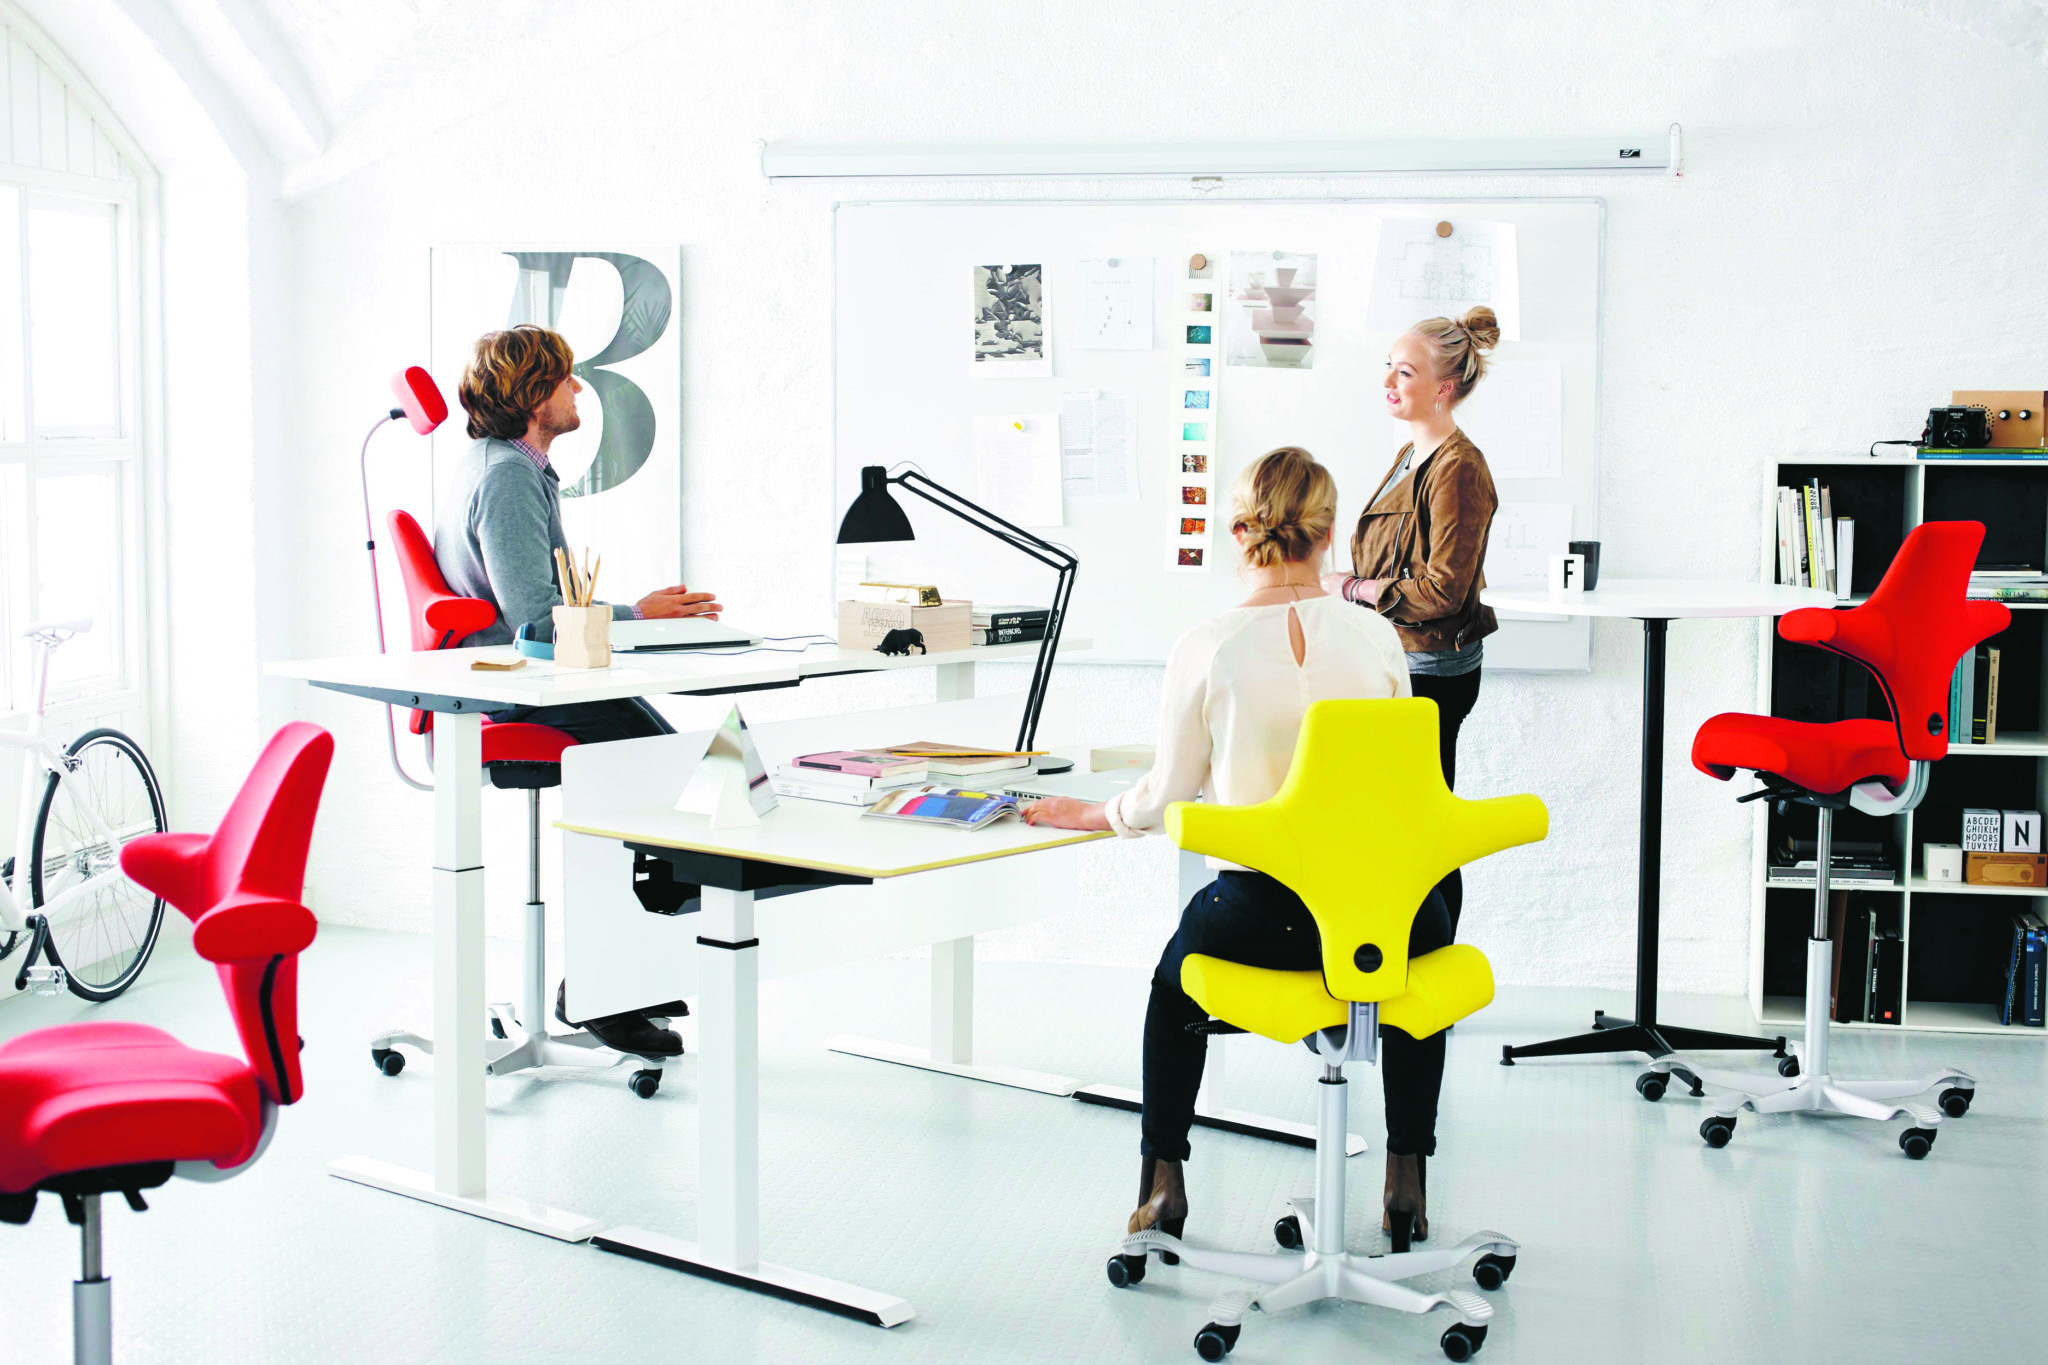 hag posture chair office lean back hÅg capisco ergocentric